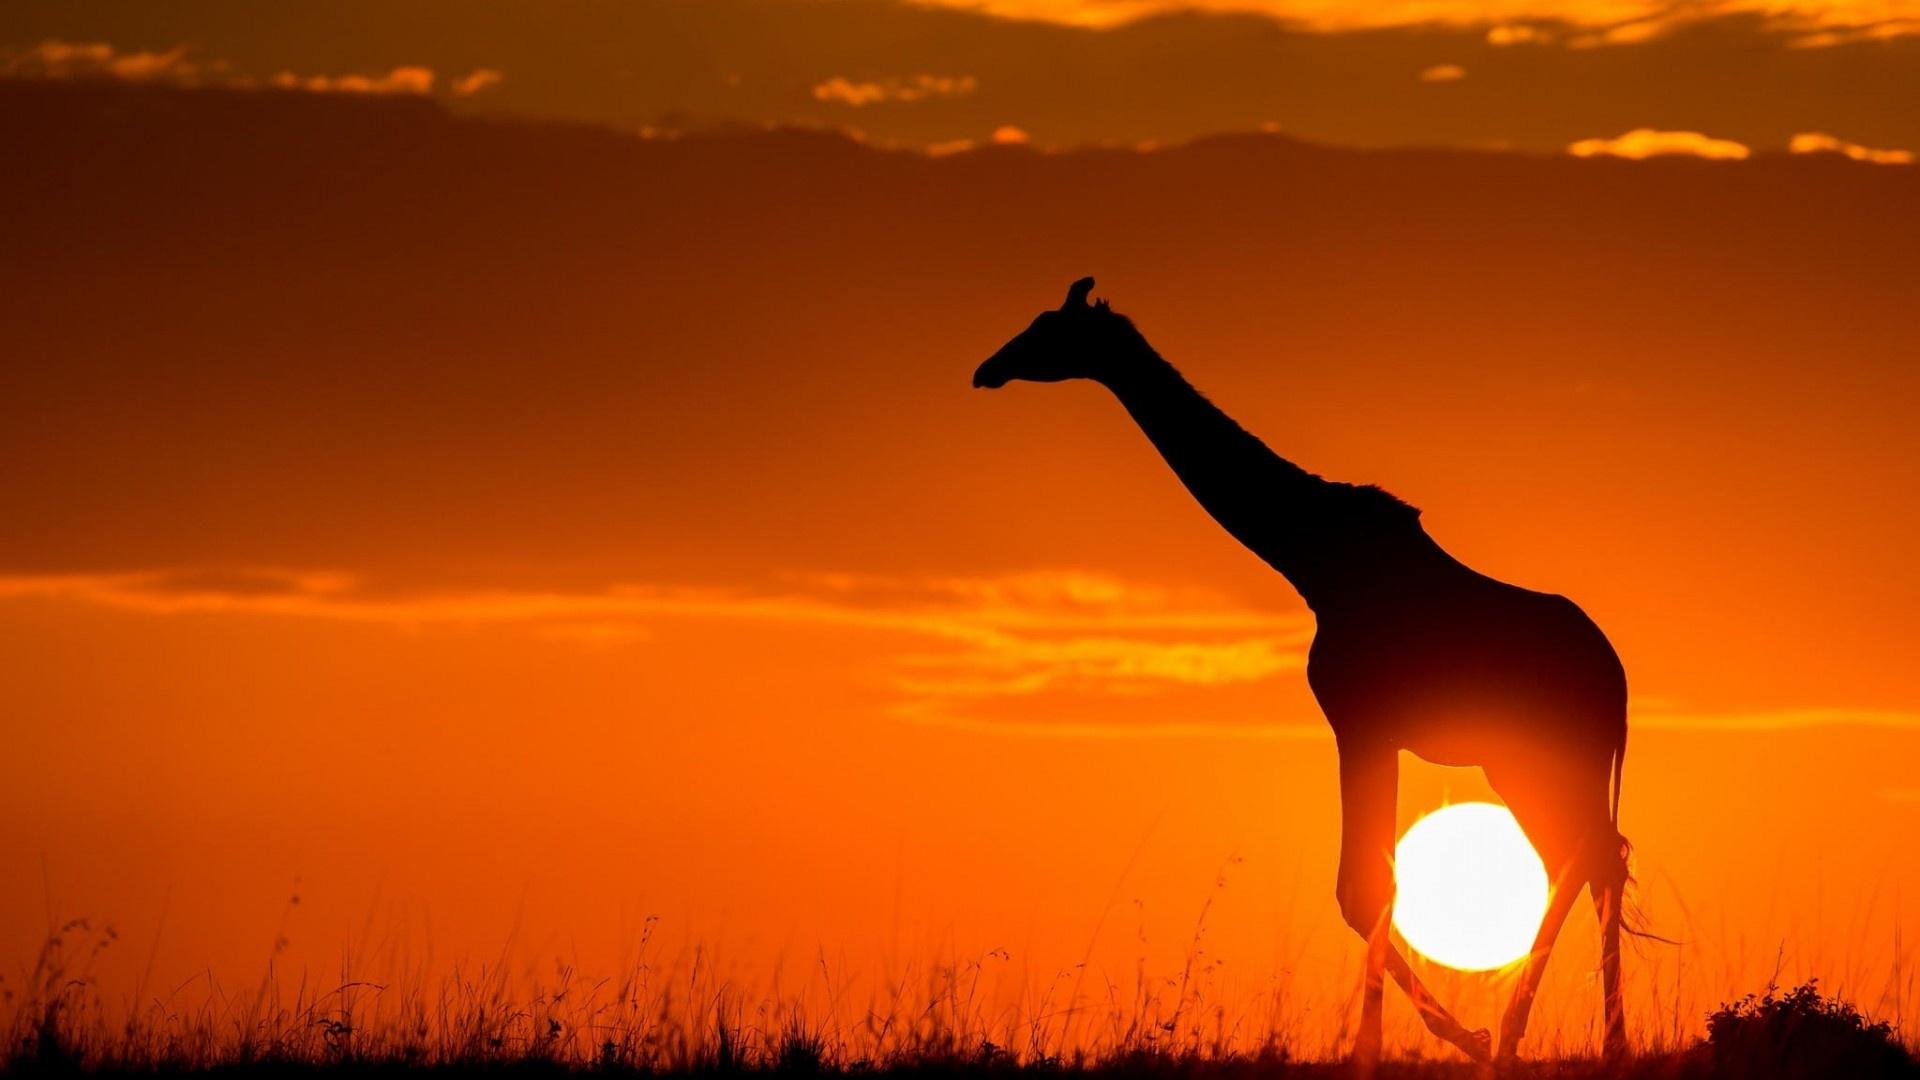 Wallpaper Hd 1080p Free Download African Animals Wallpaper Hd Pixelstalk Net